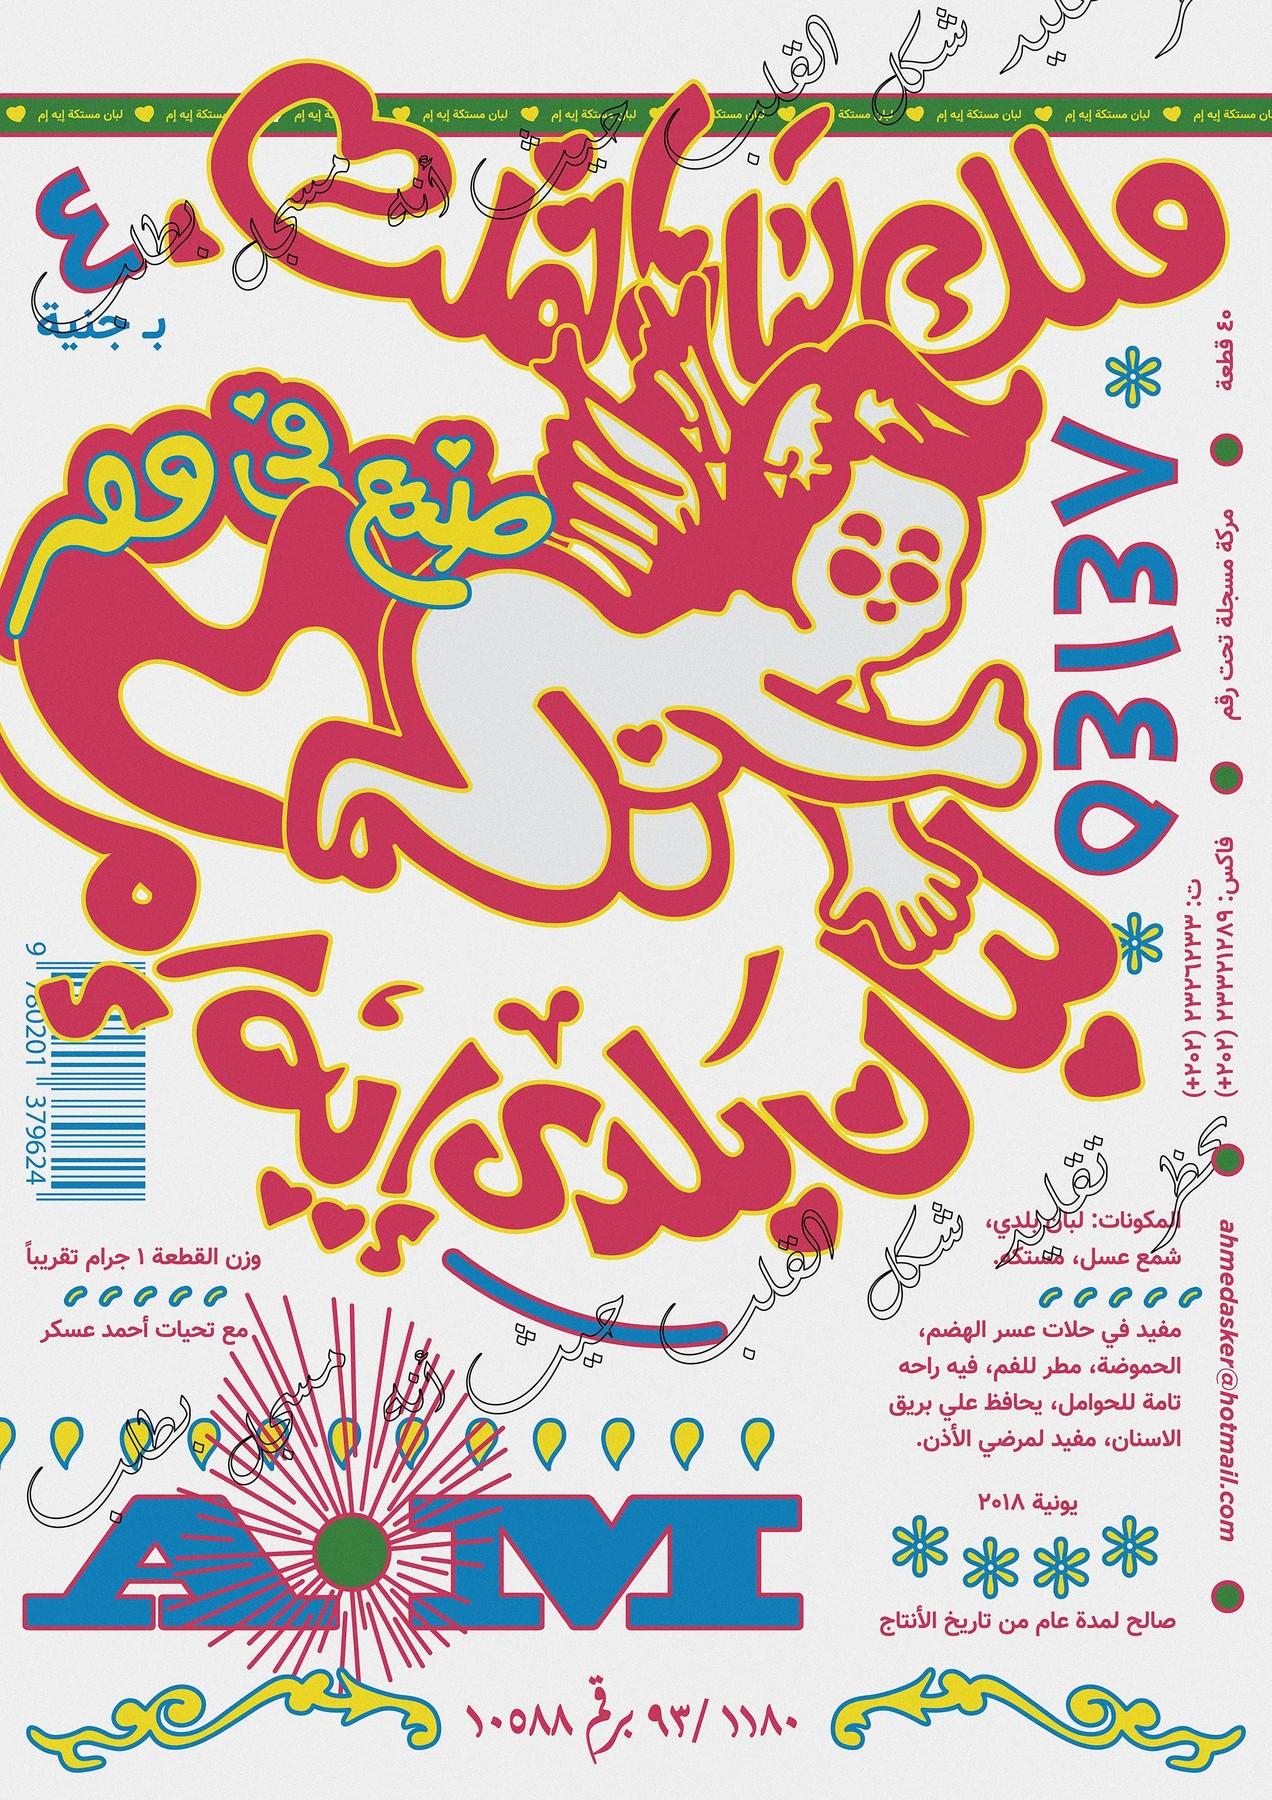 archief-cairo-graphic-design-work-itsnicethat-8.original_uejlr9atqap7akkx.jpg